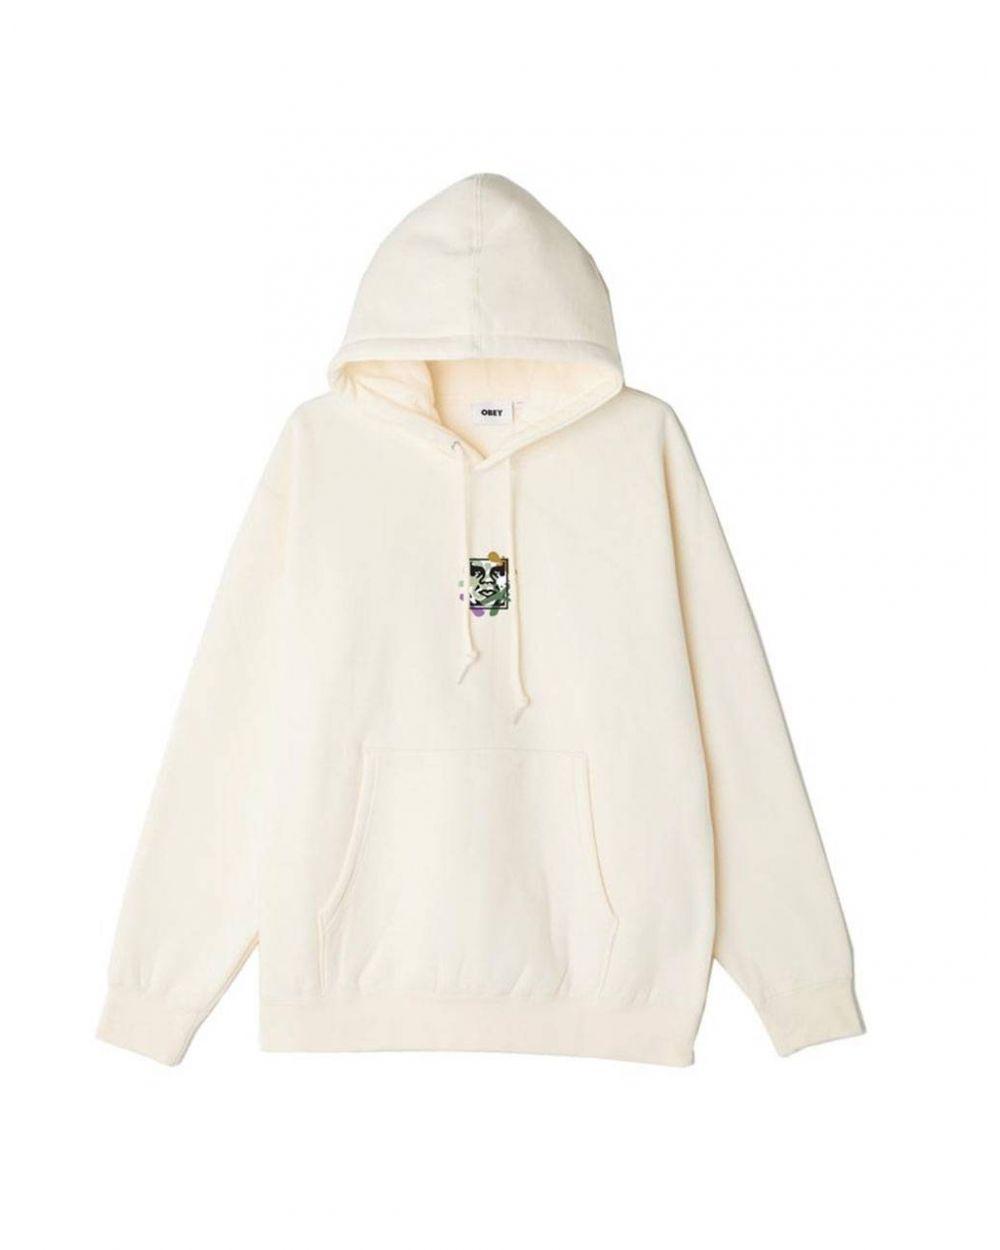 Obey Flower dance box fit premium hoodie - sago obey Sweater 81,15€